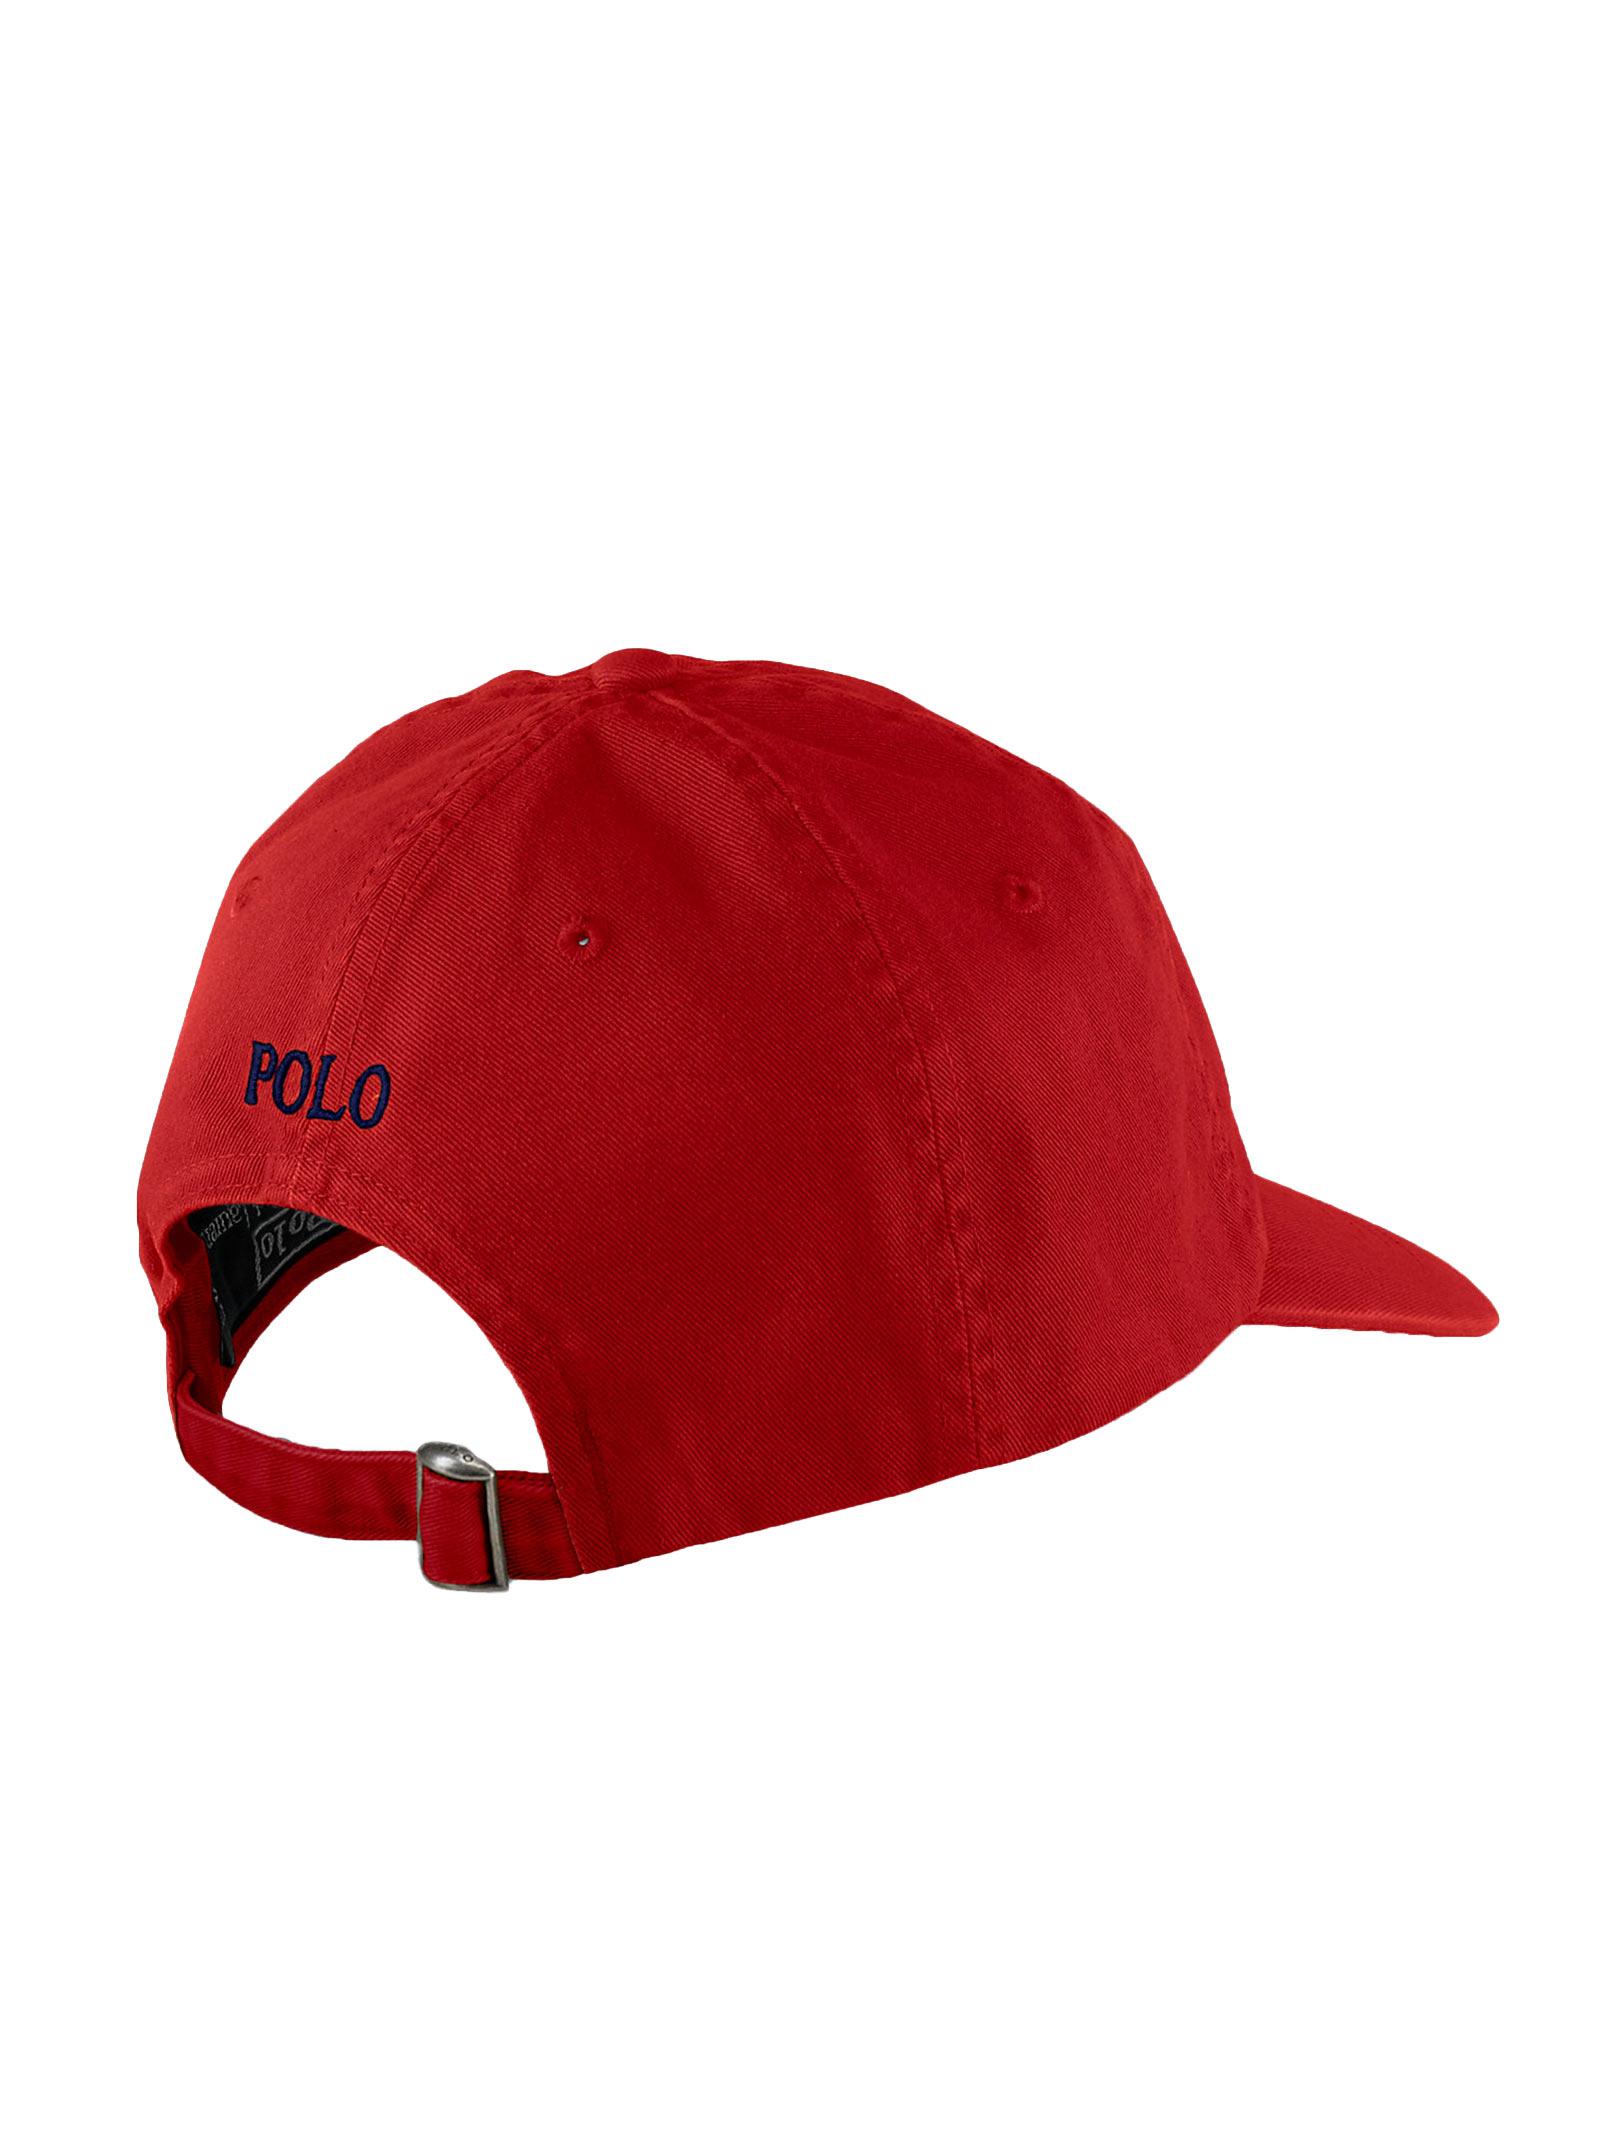 Cappello con visiera rosso RALPH LAUREN | Cappello | 710-548524002